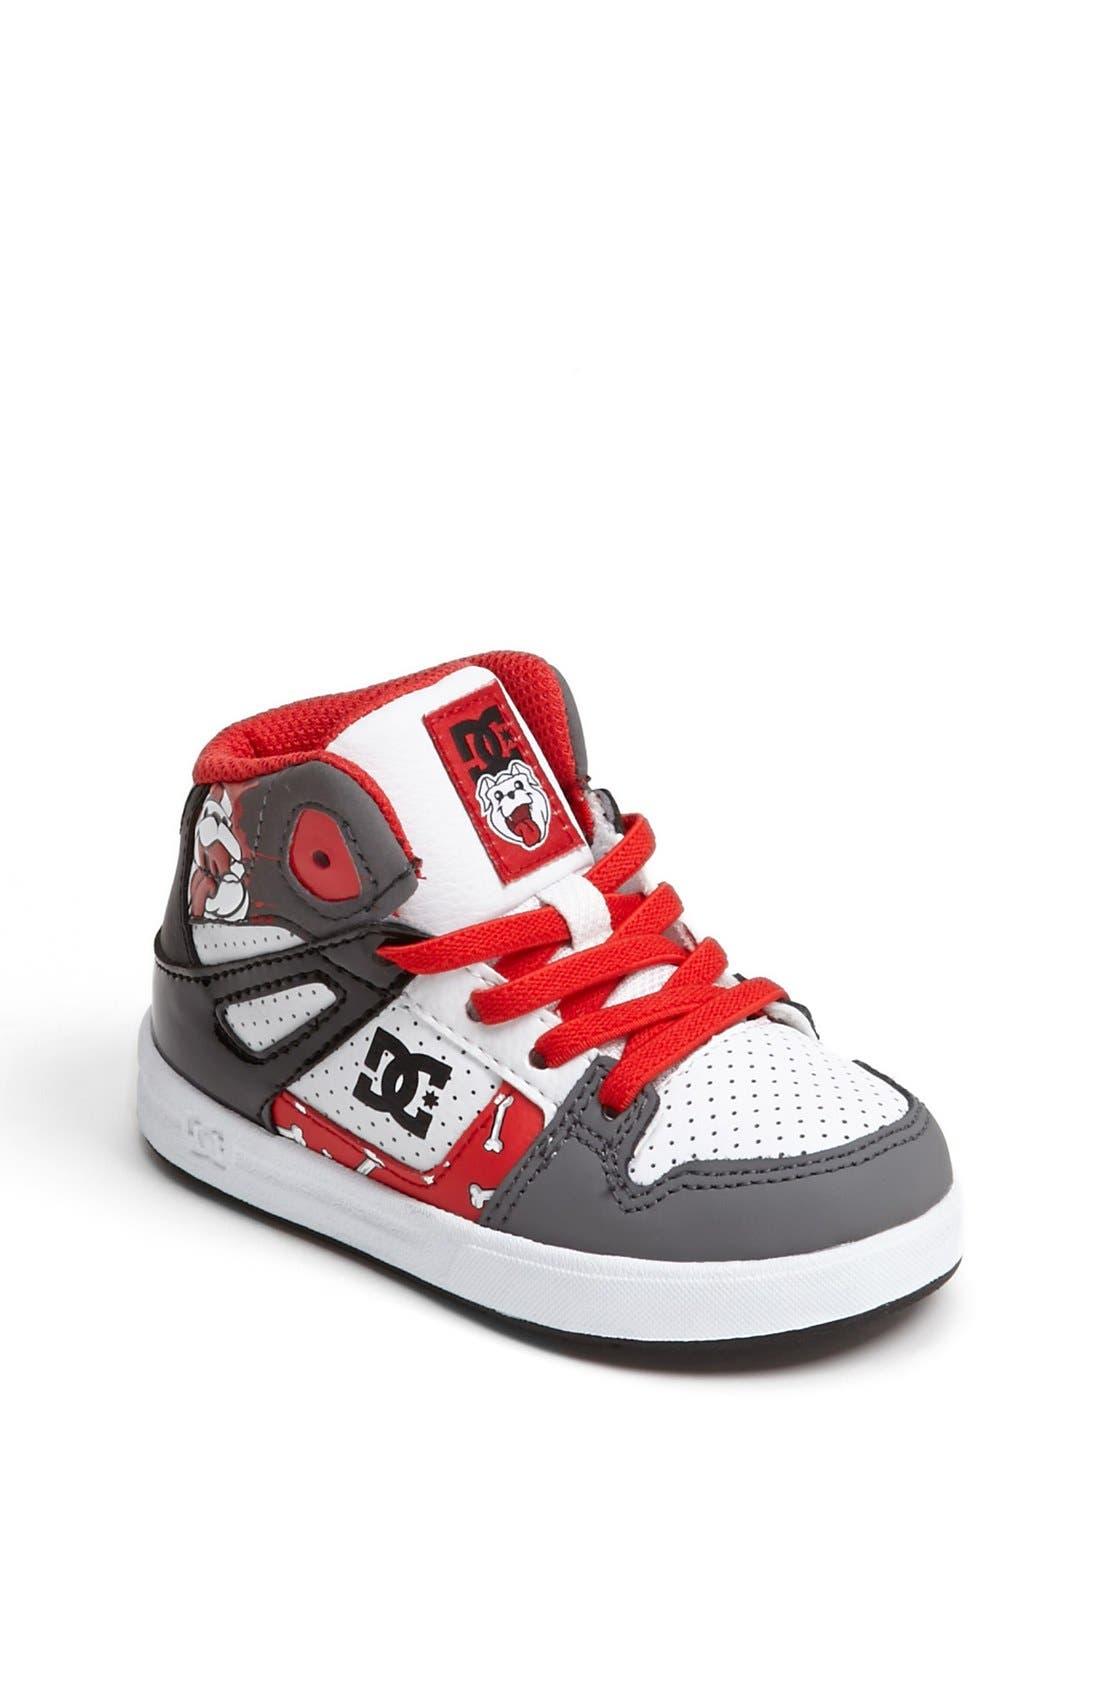 Alternate Image 1 Selected - DC Shoes 'Wild Grinders - Rebound' Sneaker (Walker & Toddler)